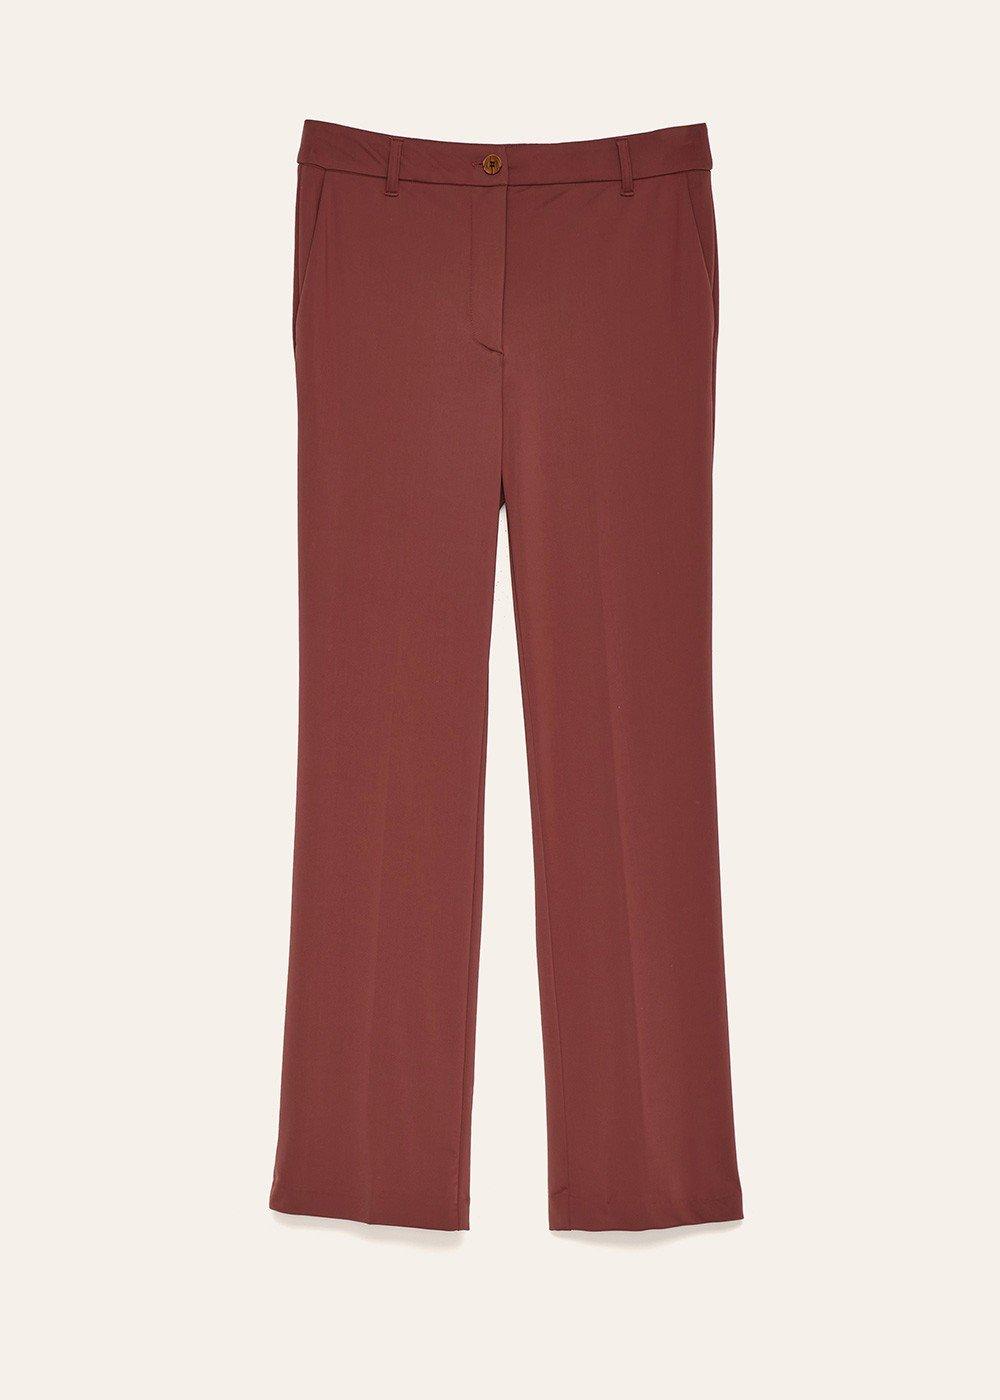 Pantalone Jacqueli tessuto tecnico - Terra - Donna